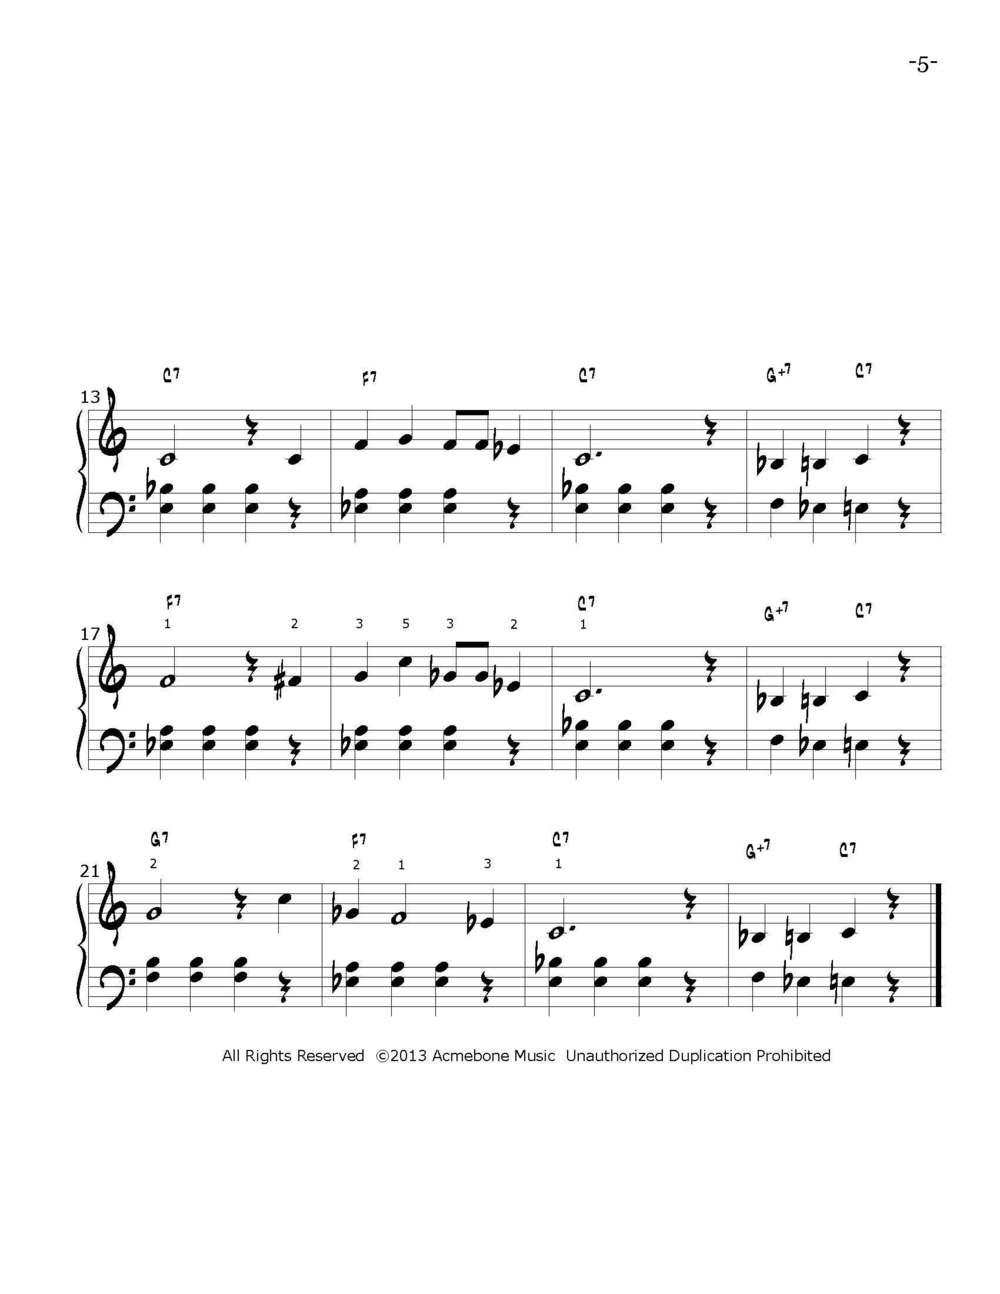 Progressive Jazz Etudes for Piano bk1 for web_Page_06.jpg